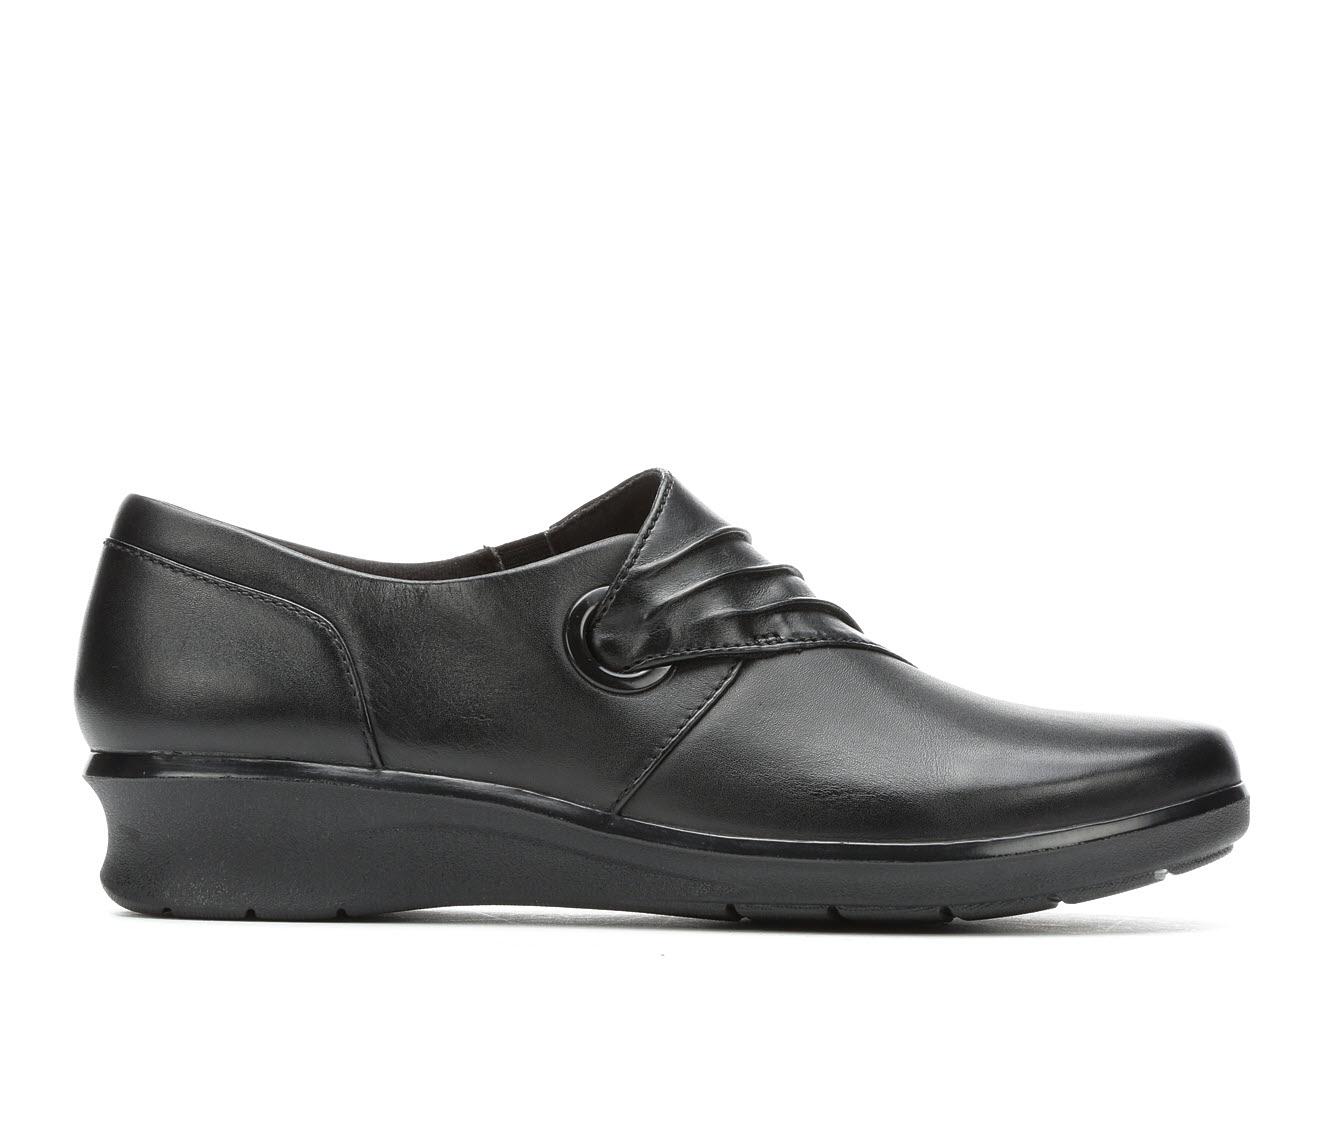 Clarks Hope Shine Women's Shoe (Black Leather)